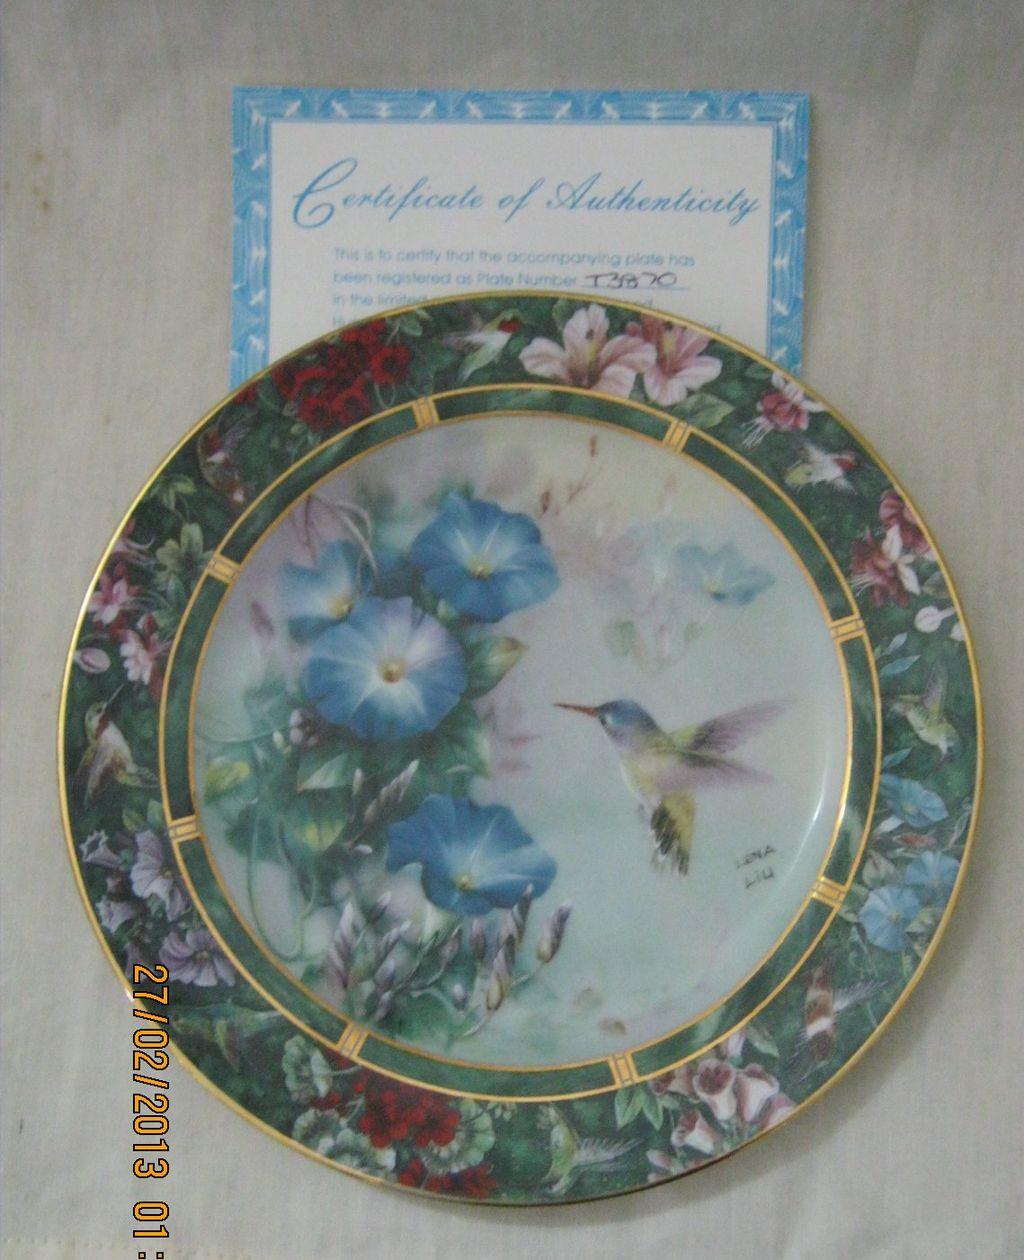 Lena Liu's Humming Bird Treasury By W.L. George Fine China 3rd Issue Plate 1992